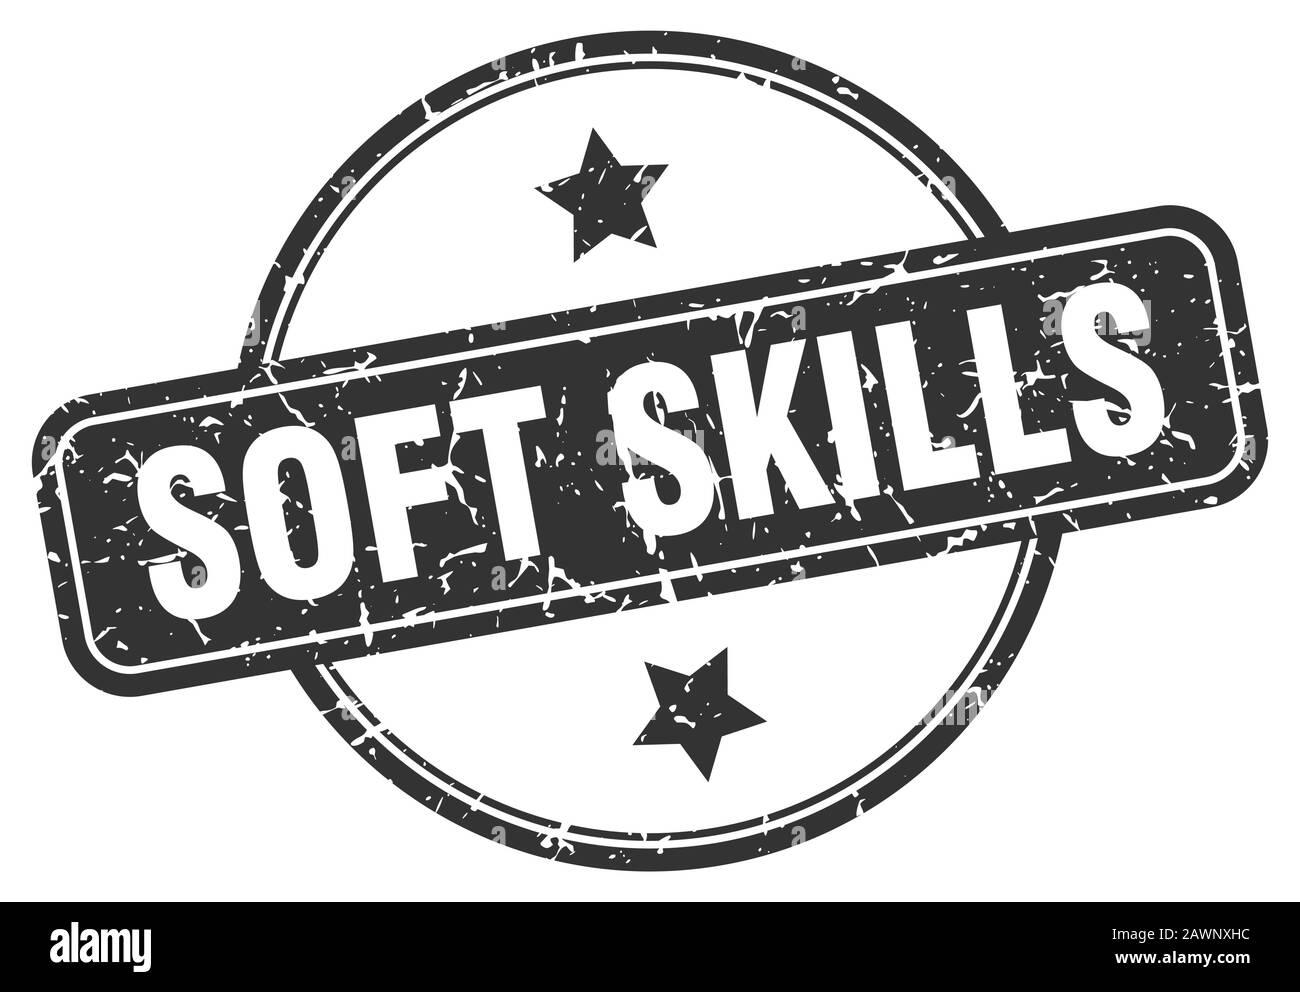 Soft Skills Black And White Stock Photos Images Alamy